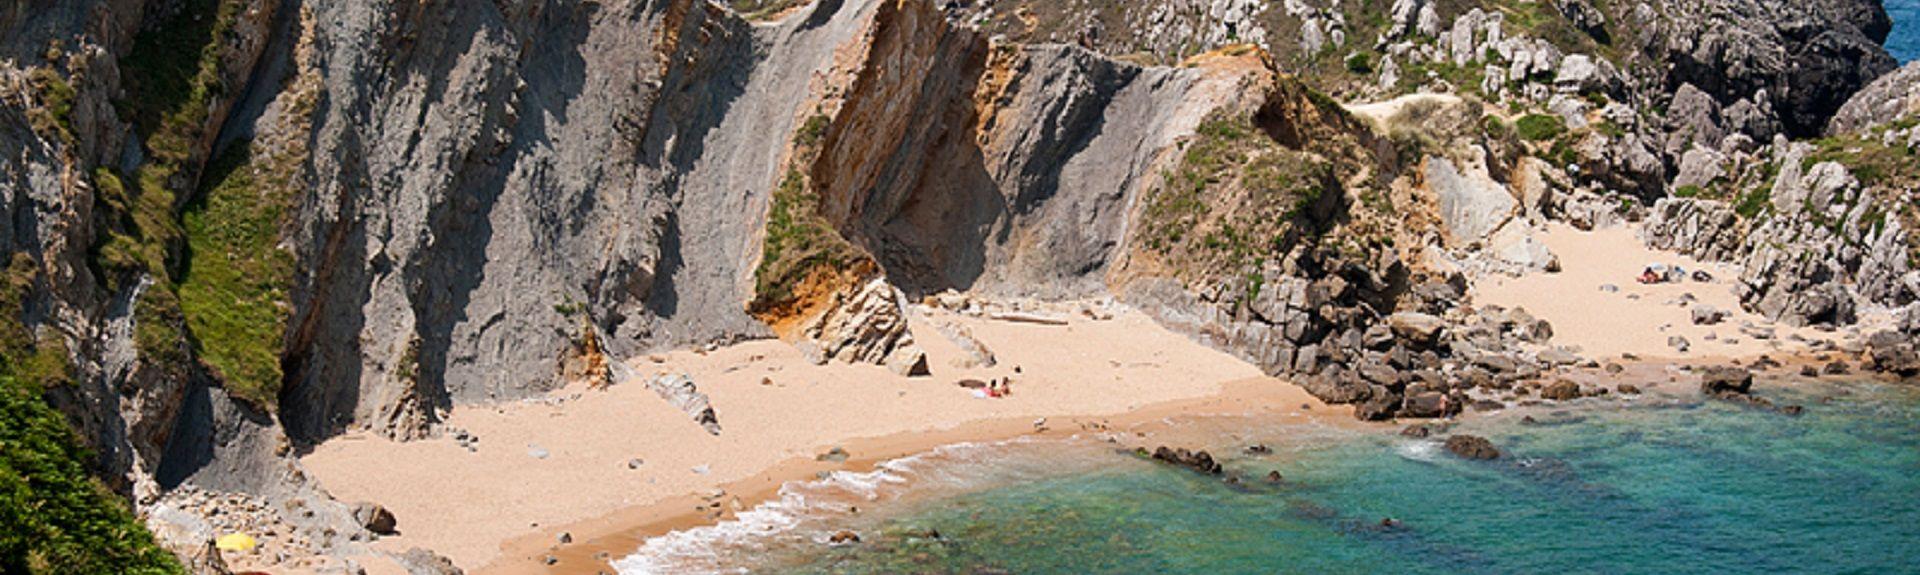 Polanco, Cantabria, Spain